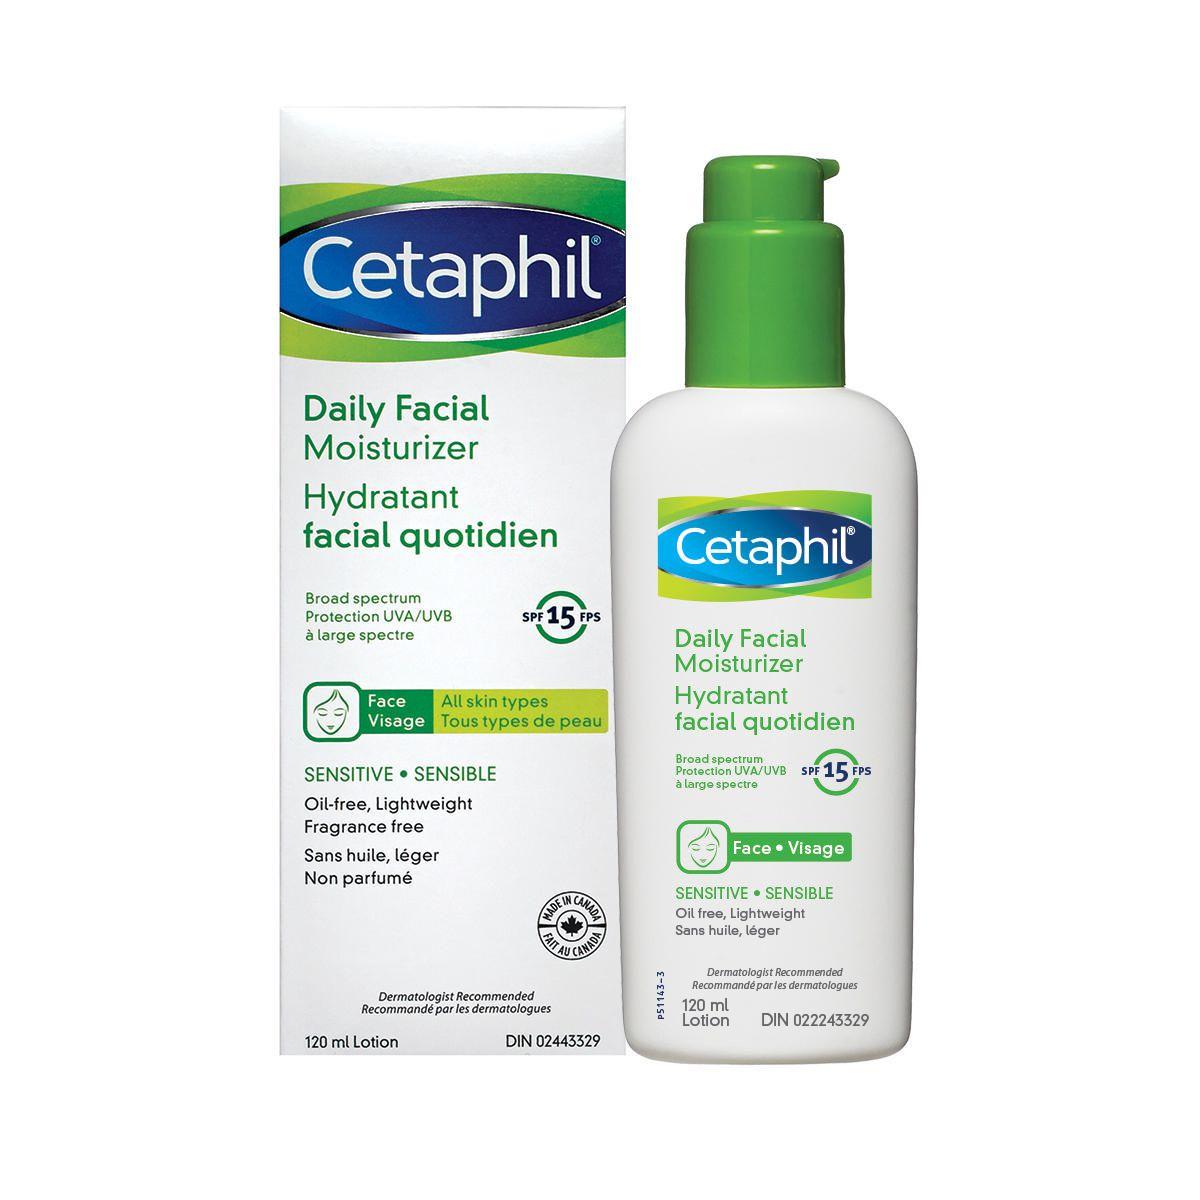 Beauty Bulletin: Cetaphil Moisturizer